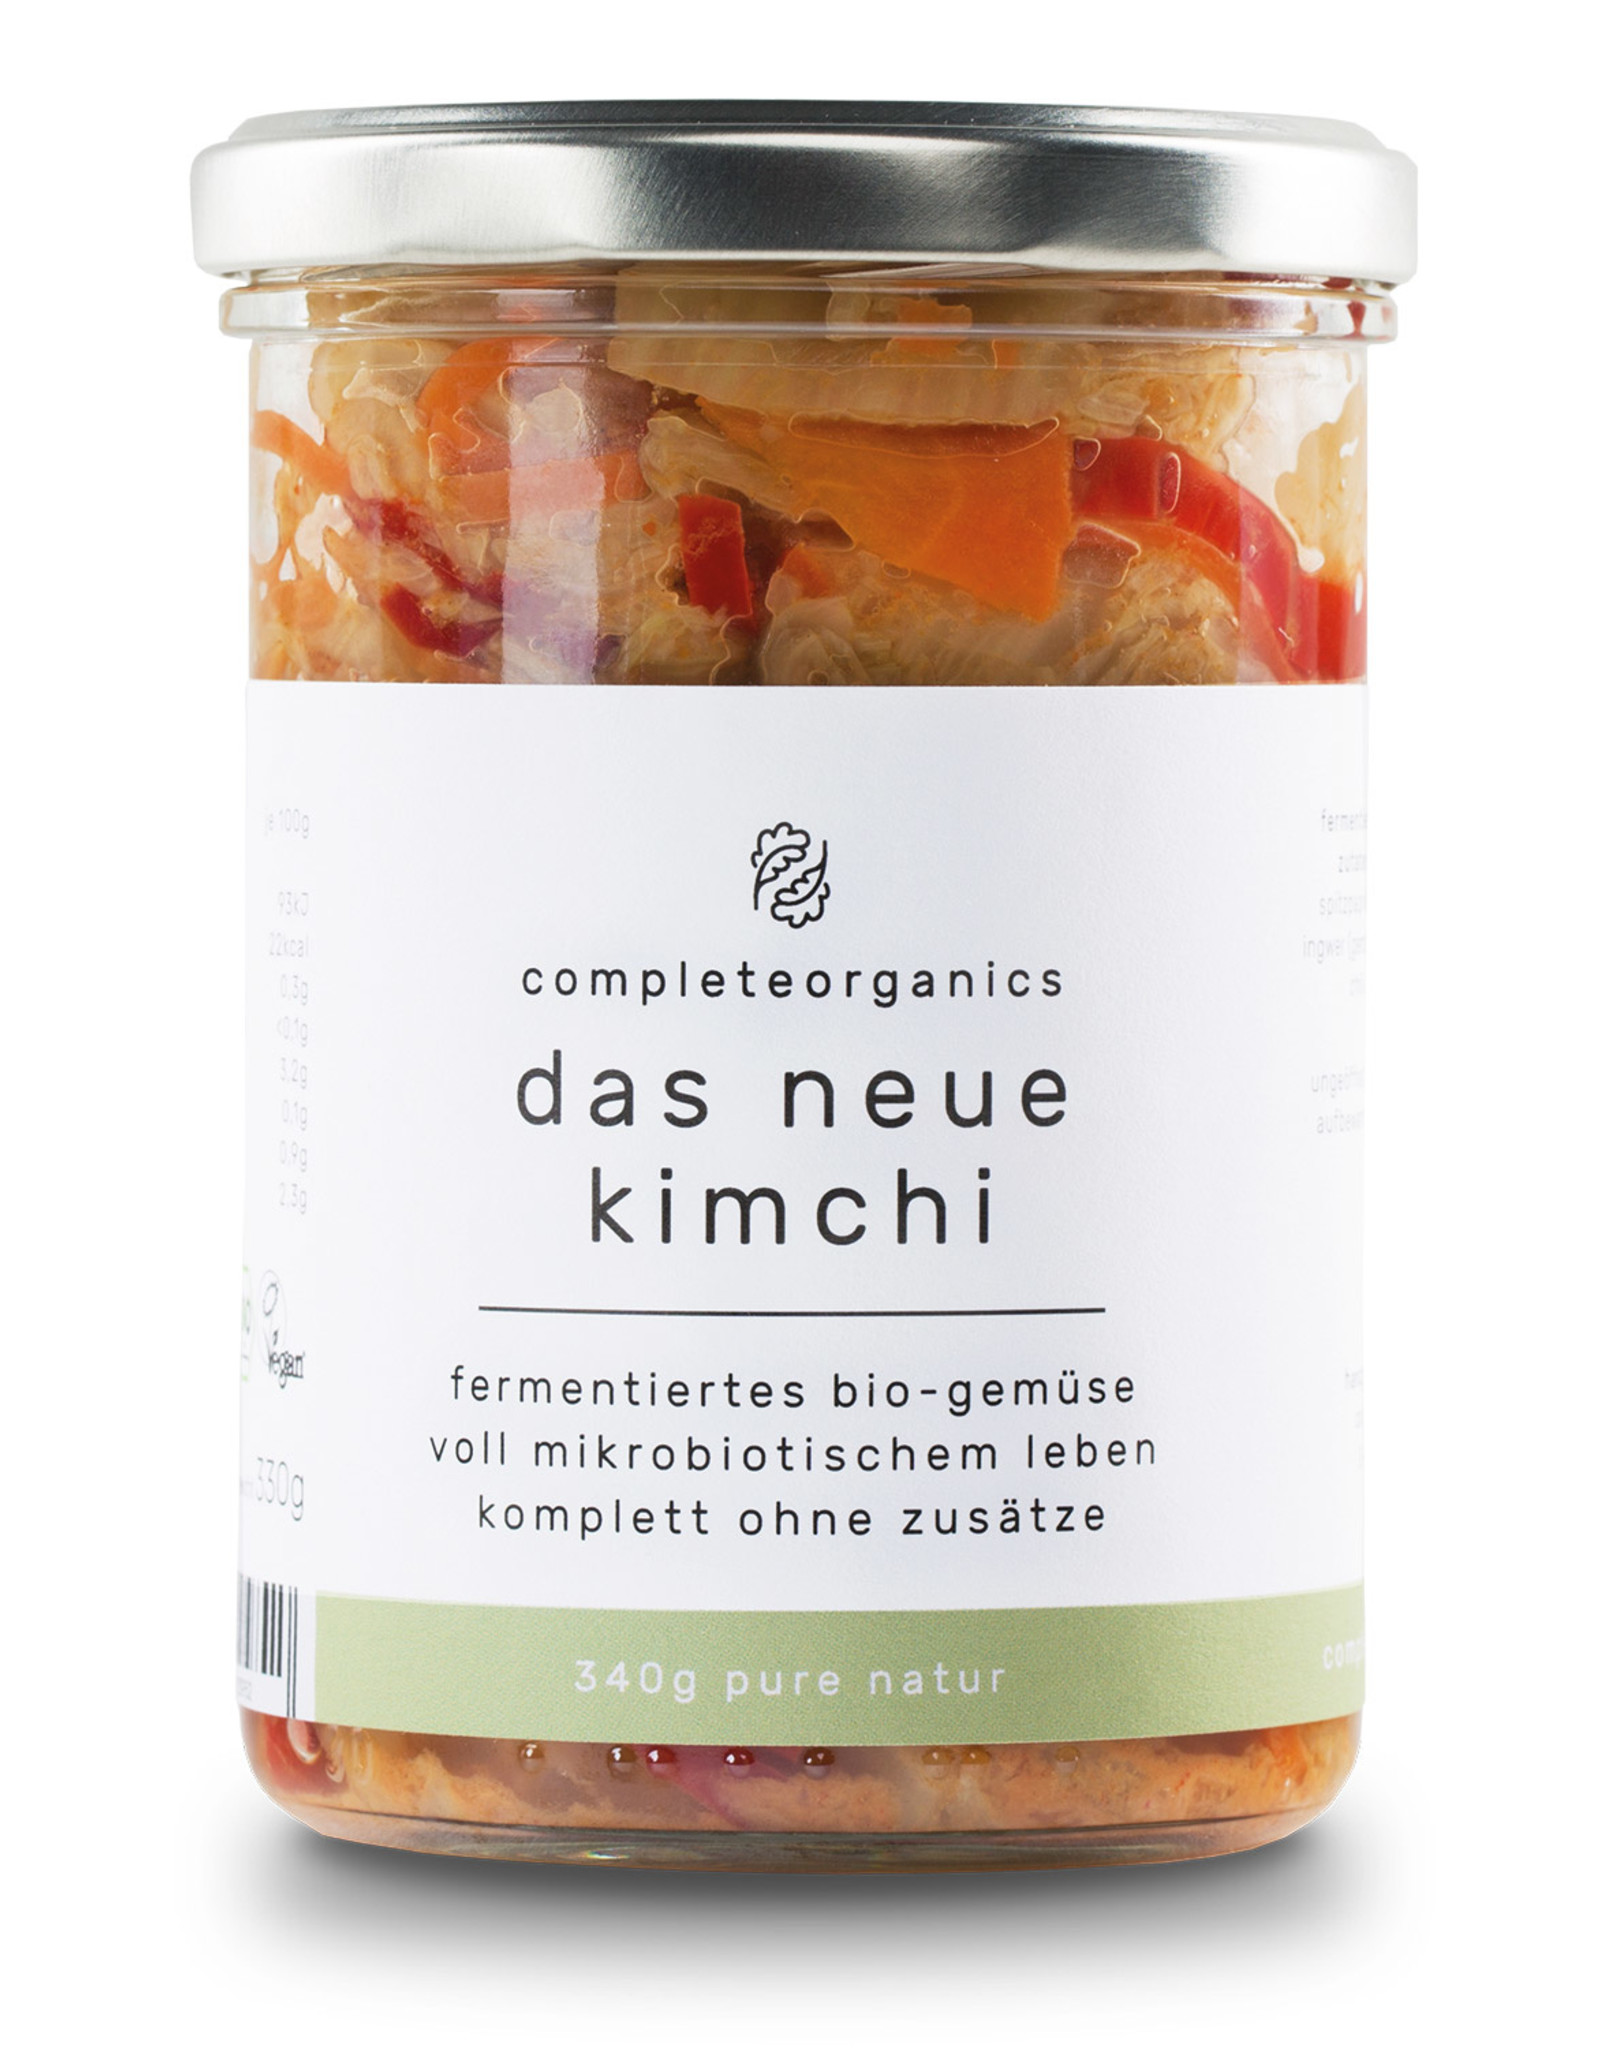 Completeorganics el nuevo Kimchi, verduras fermentadas, 340g